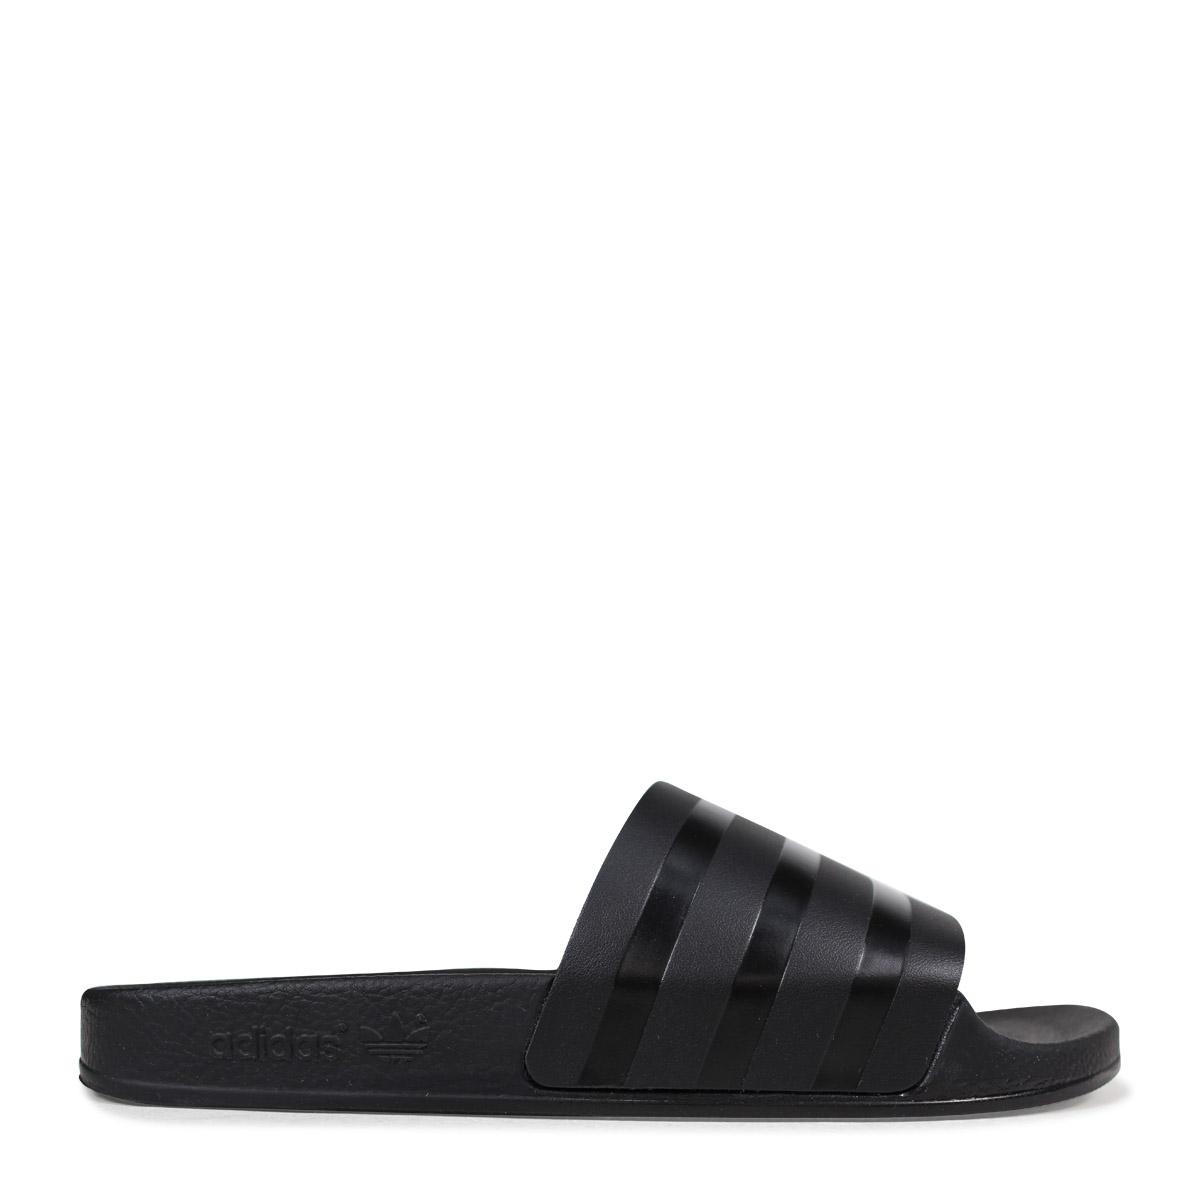 official photos d2b3e 00d1e アディダスアディレッタ adidas Originals sandals shower sandals ADILETTE SLIDES men  CQ3094 black originals  4 19 Shinnyu load